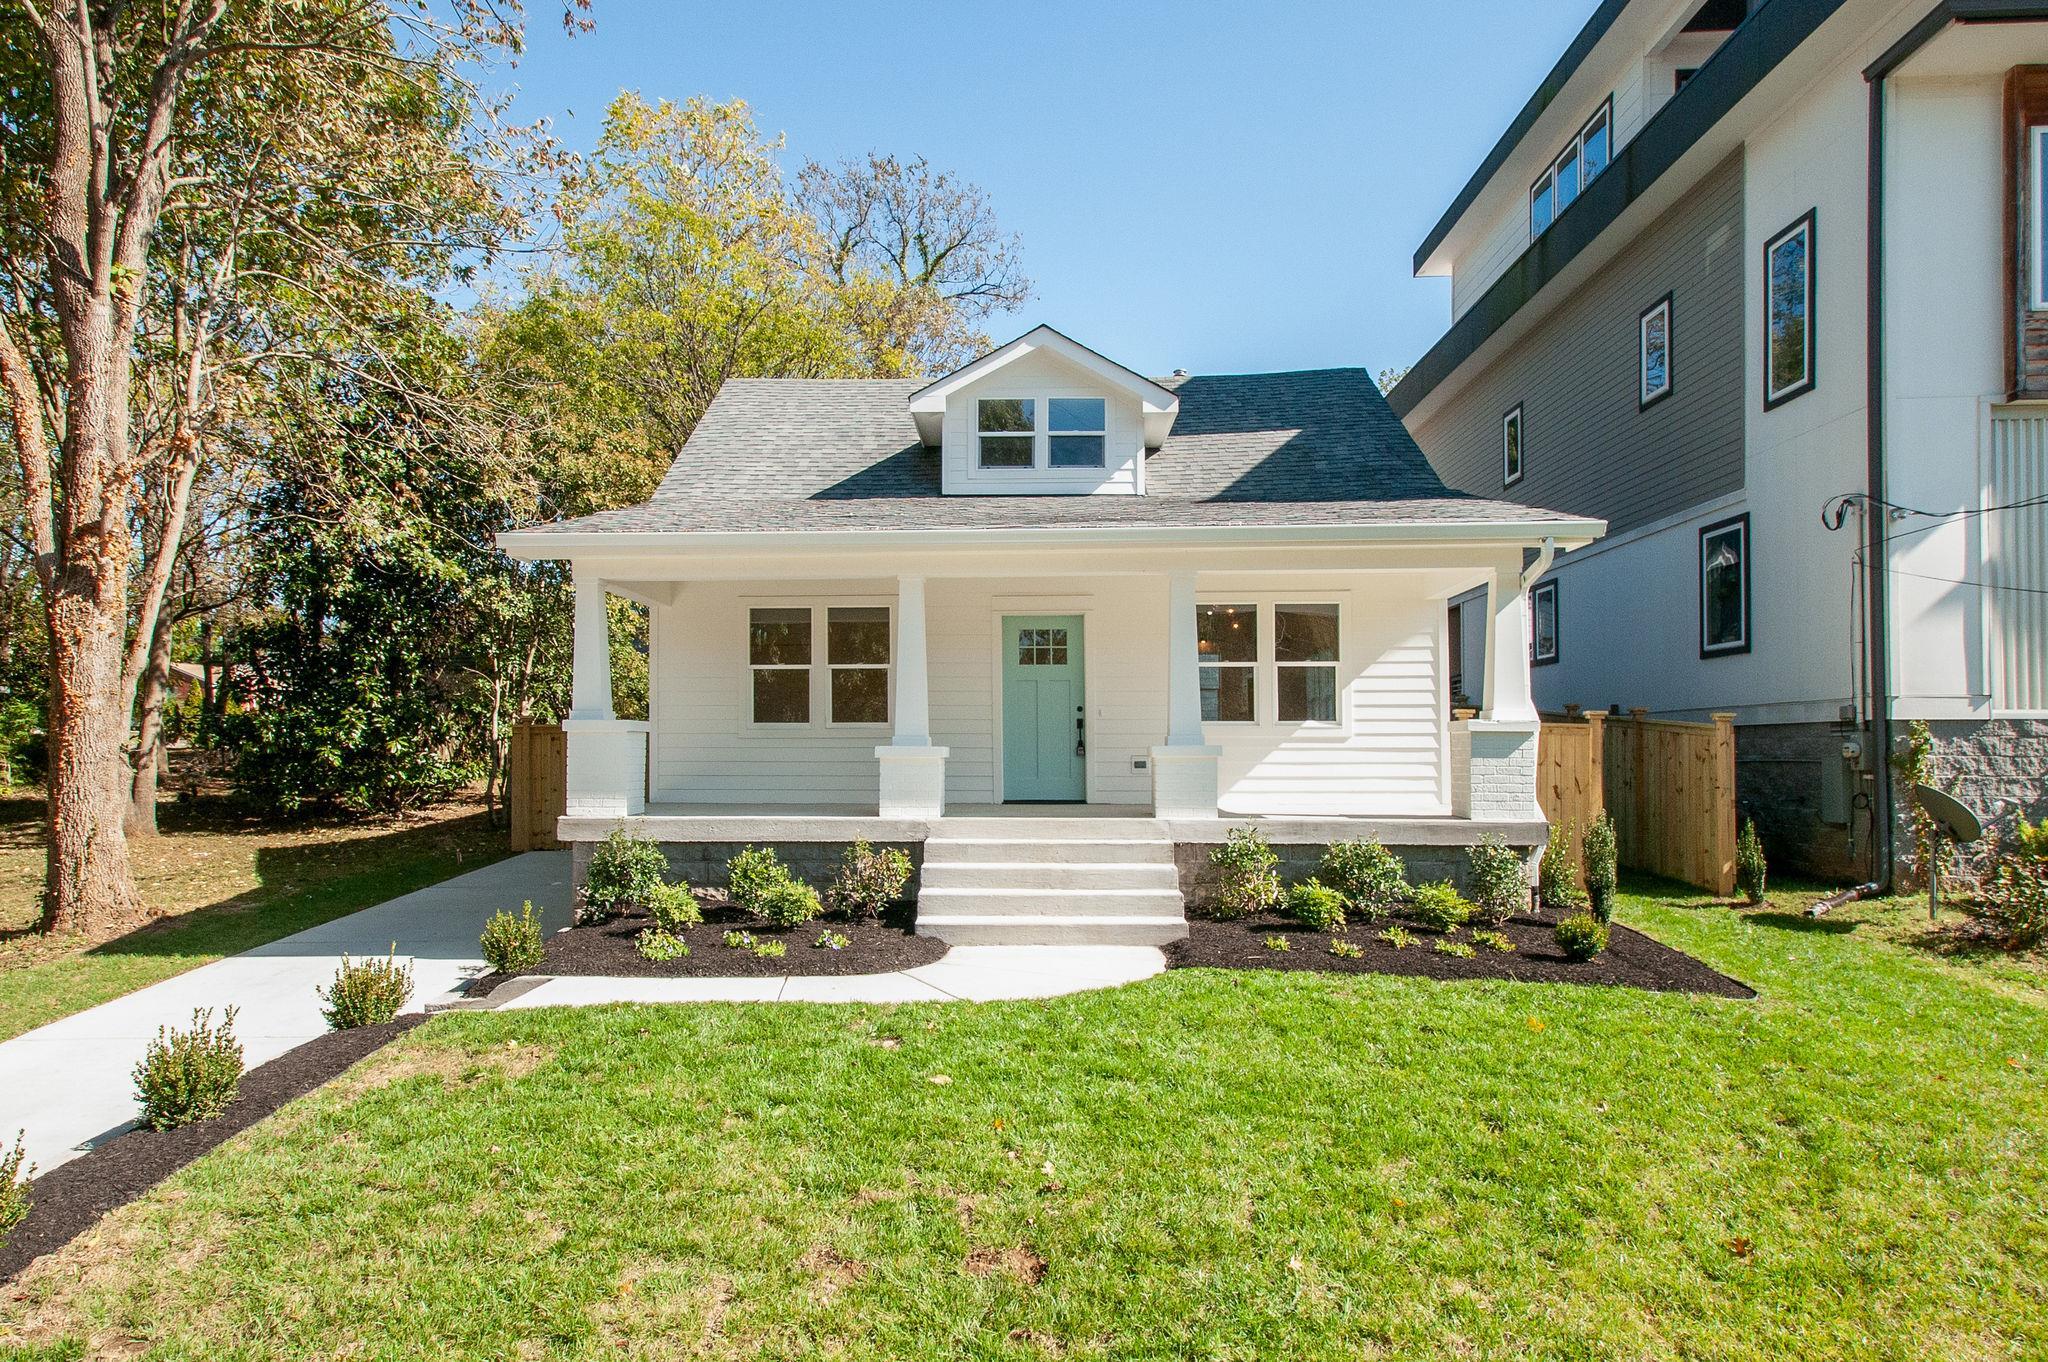 814 Powers Ave, Nashville, TN 37206 - Nashville, TN real estate listing